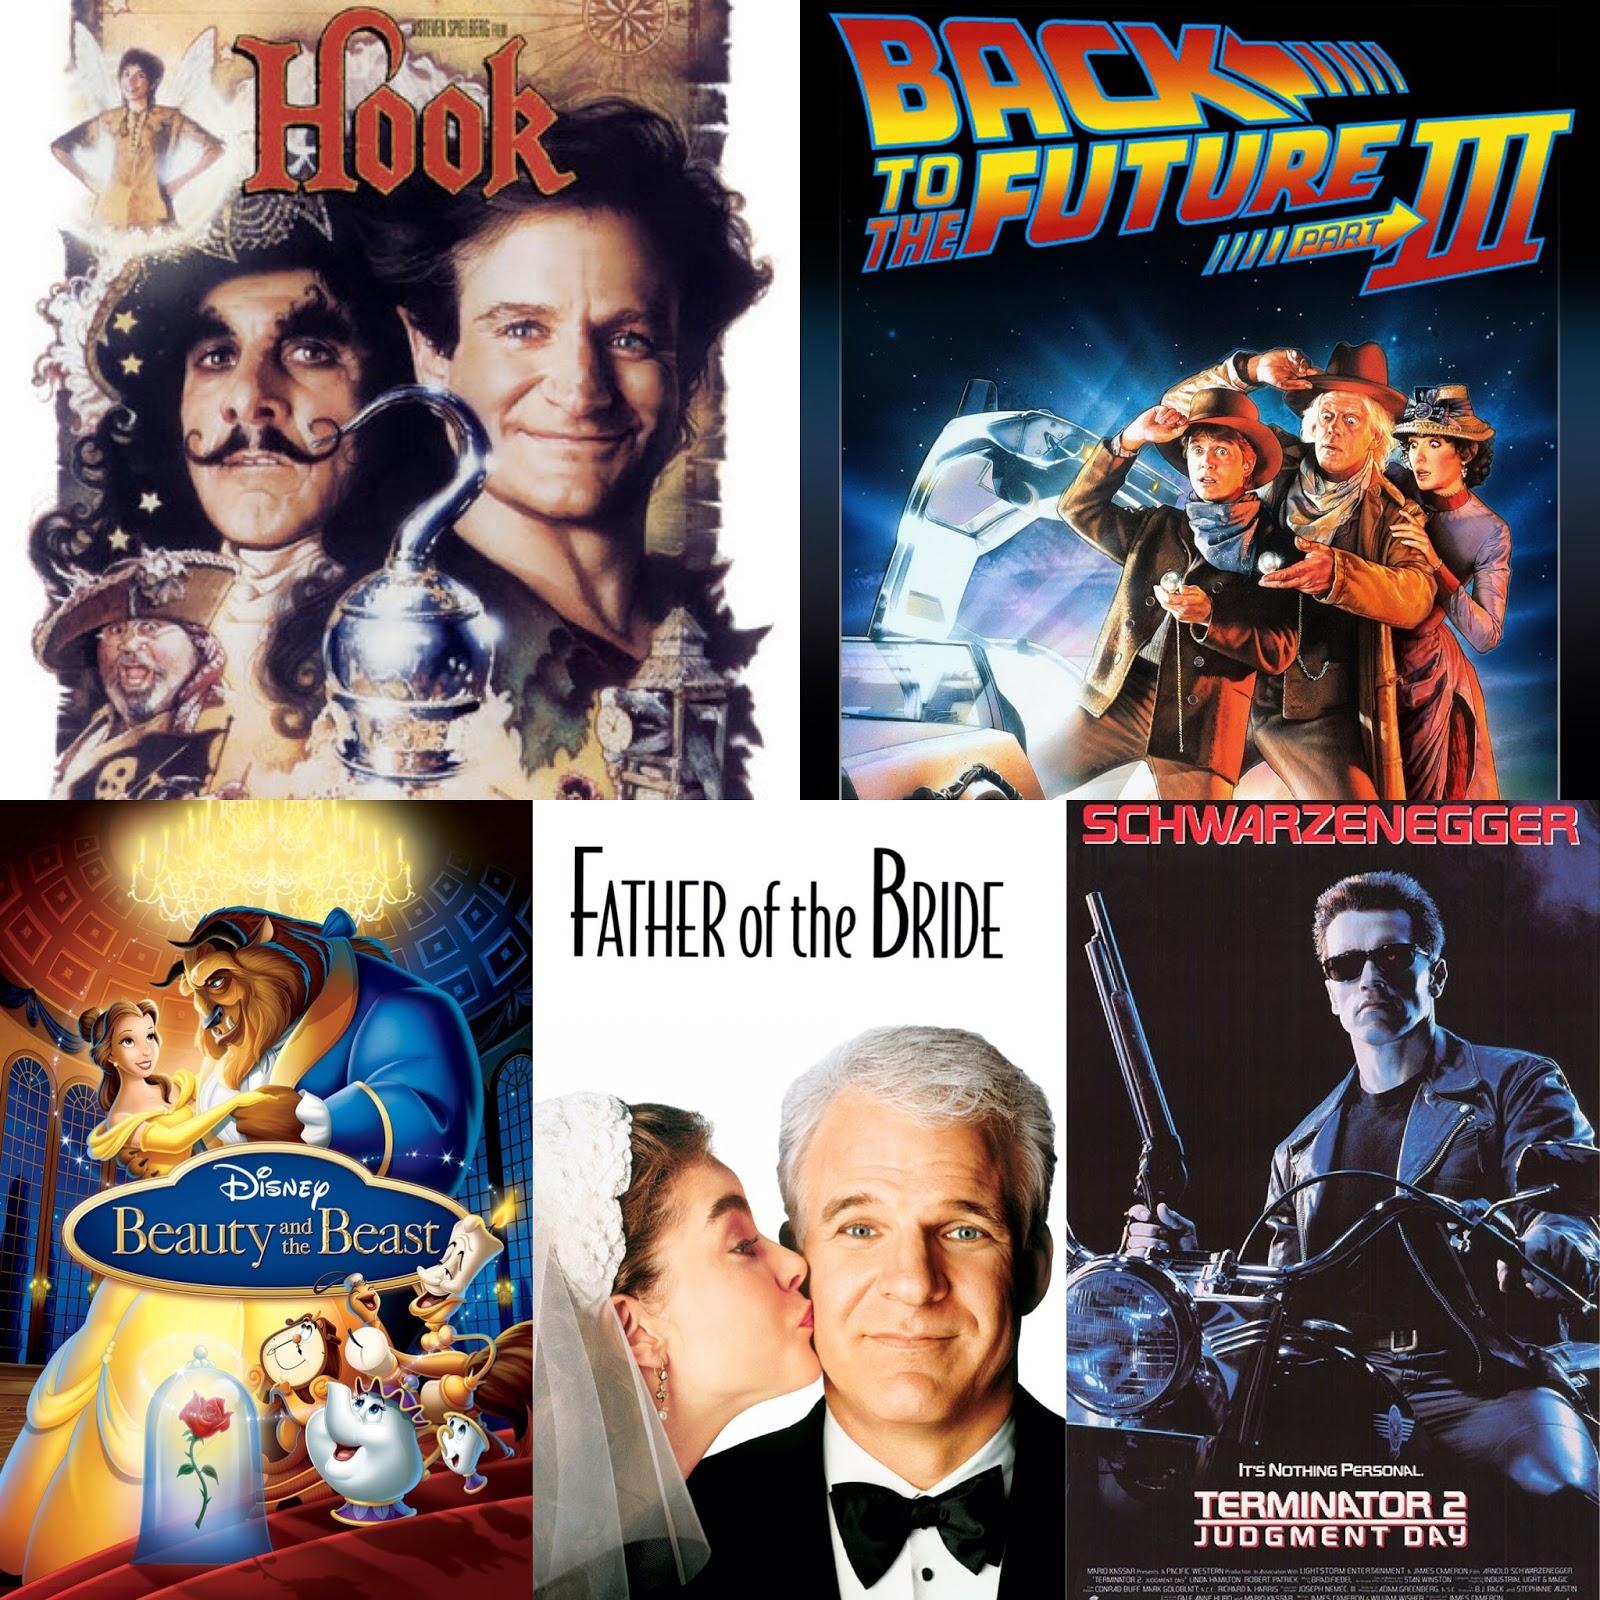 jennifer neyhart 1990 1991 movies